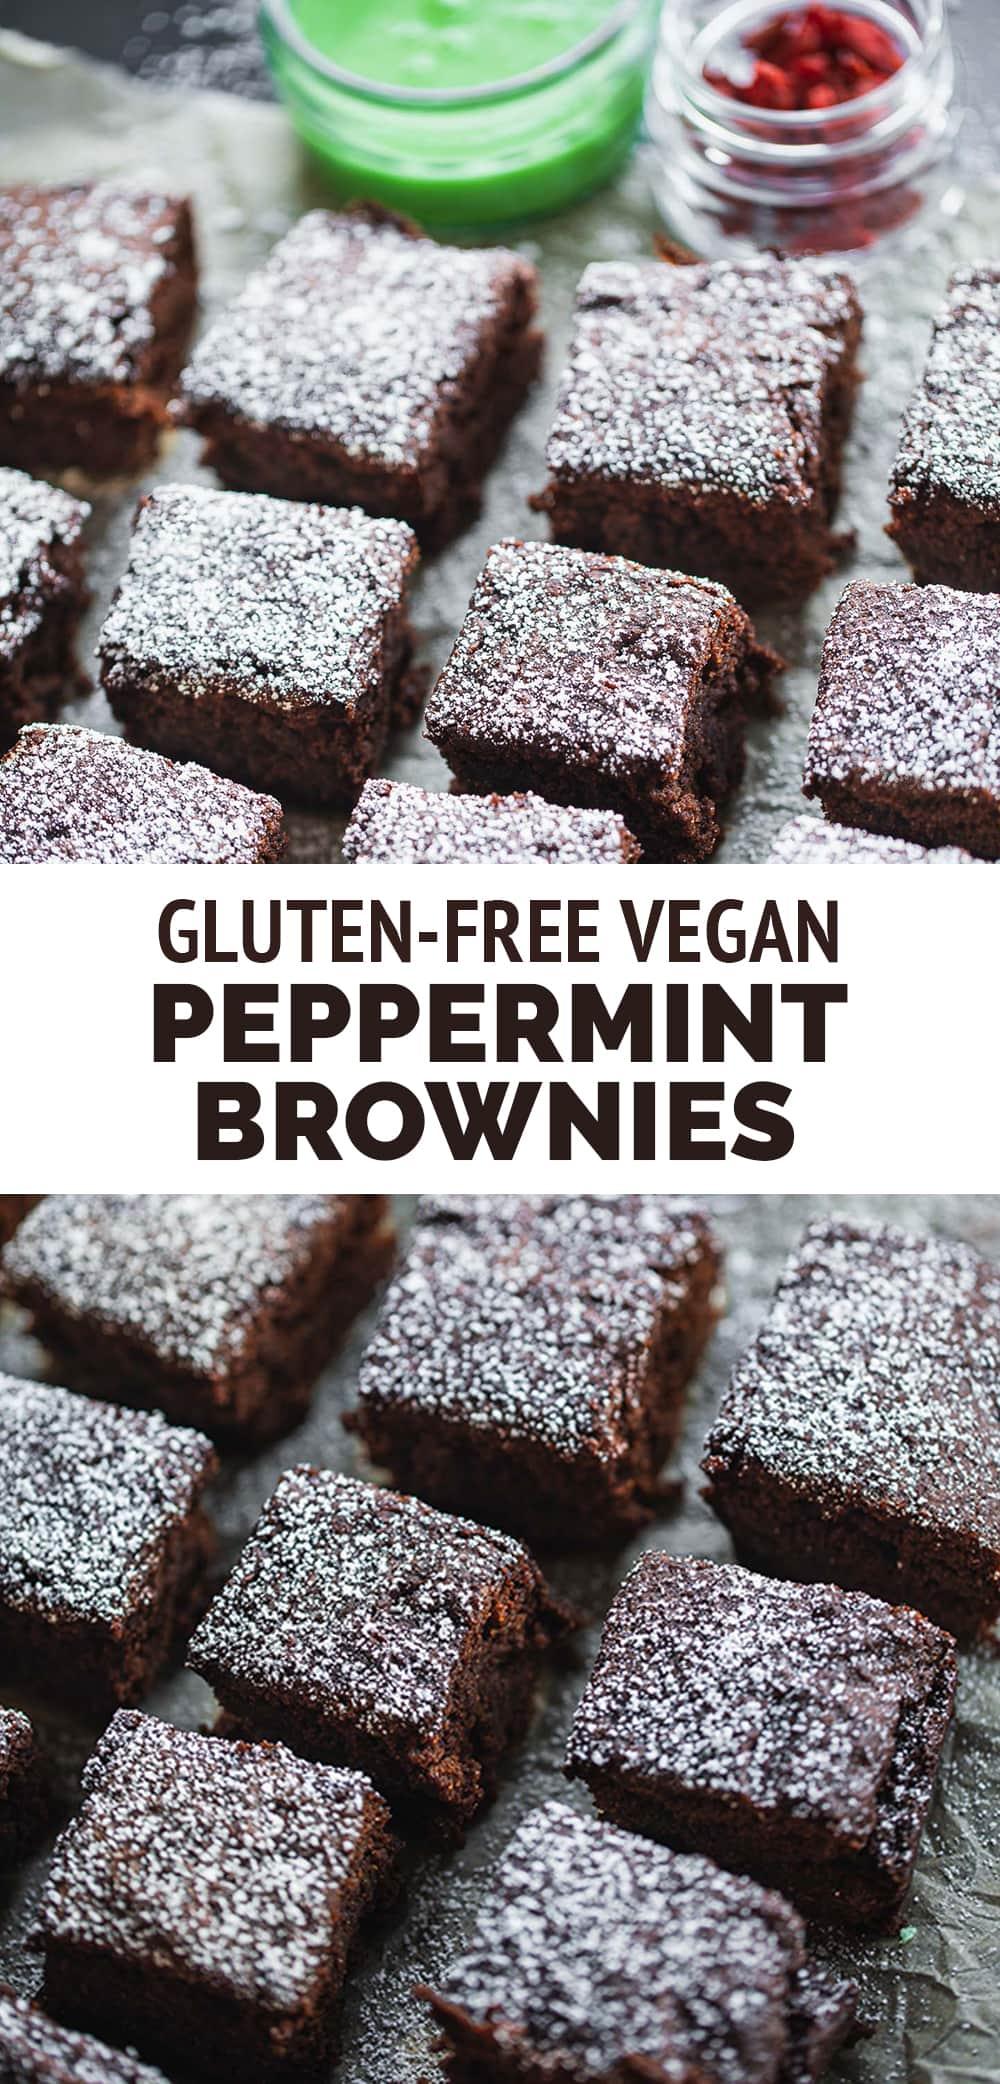 Vegan peppermint brownies gluten-free